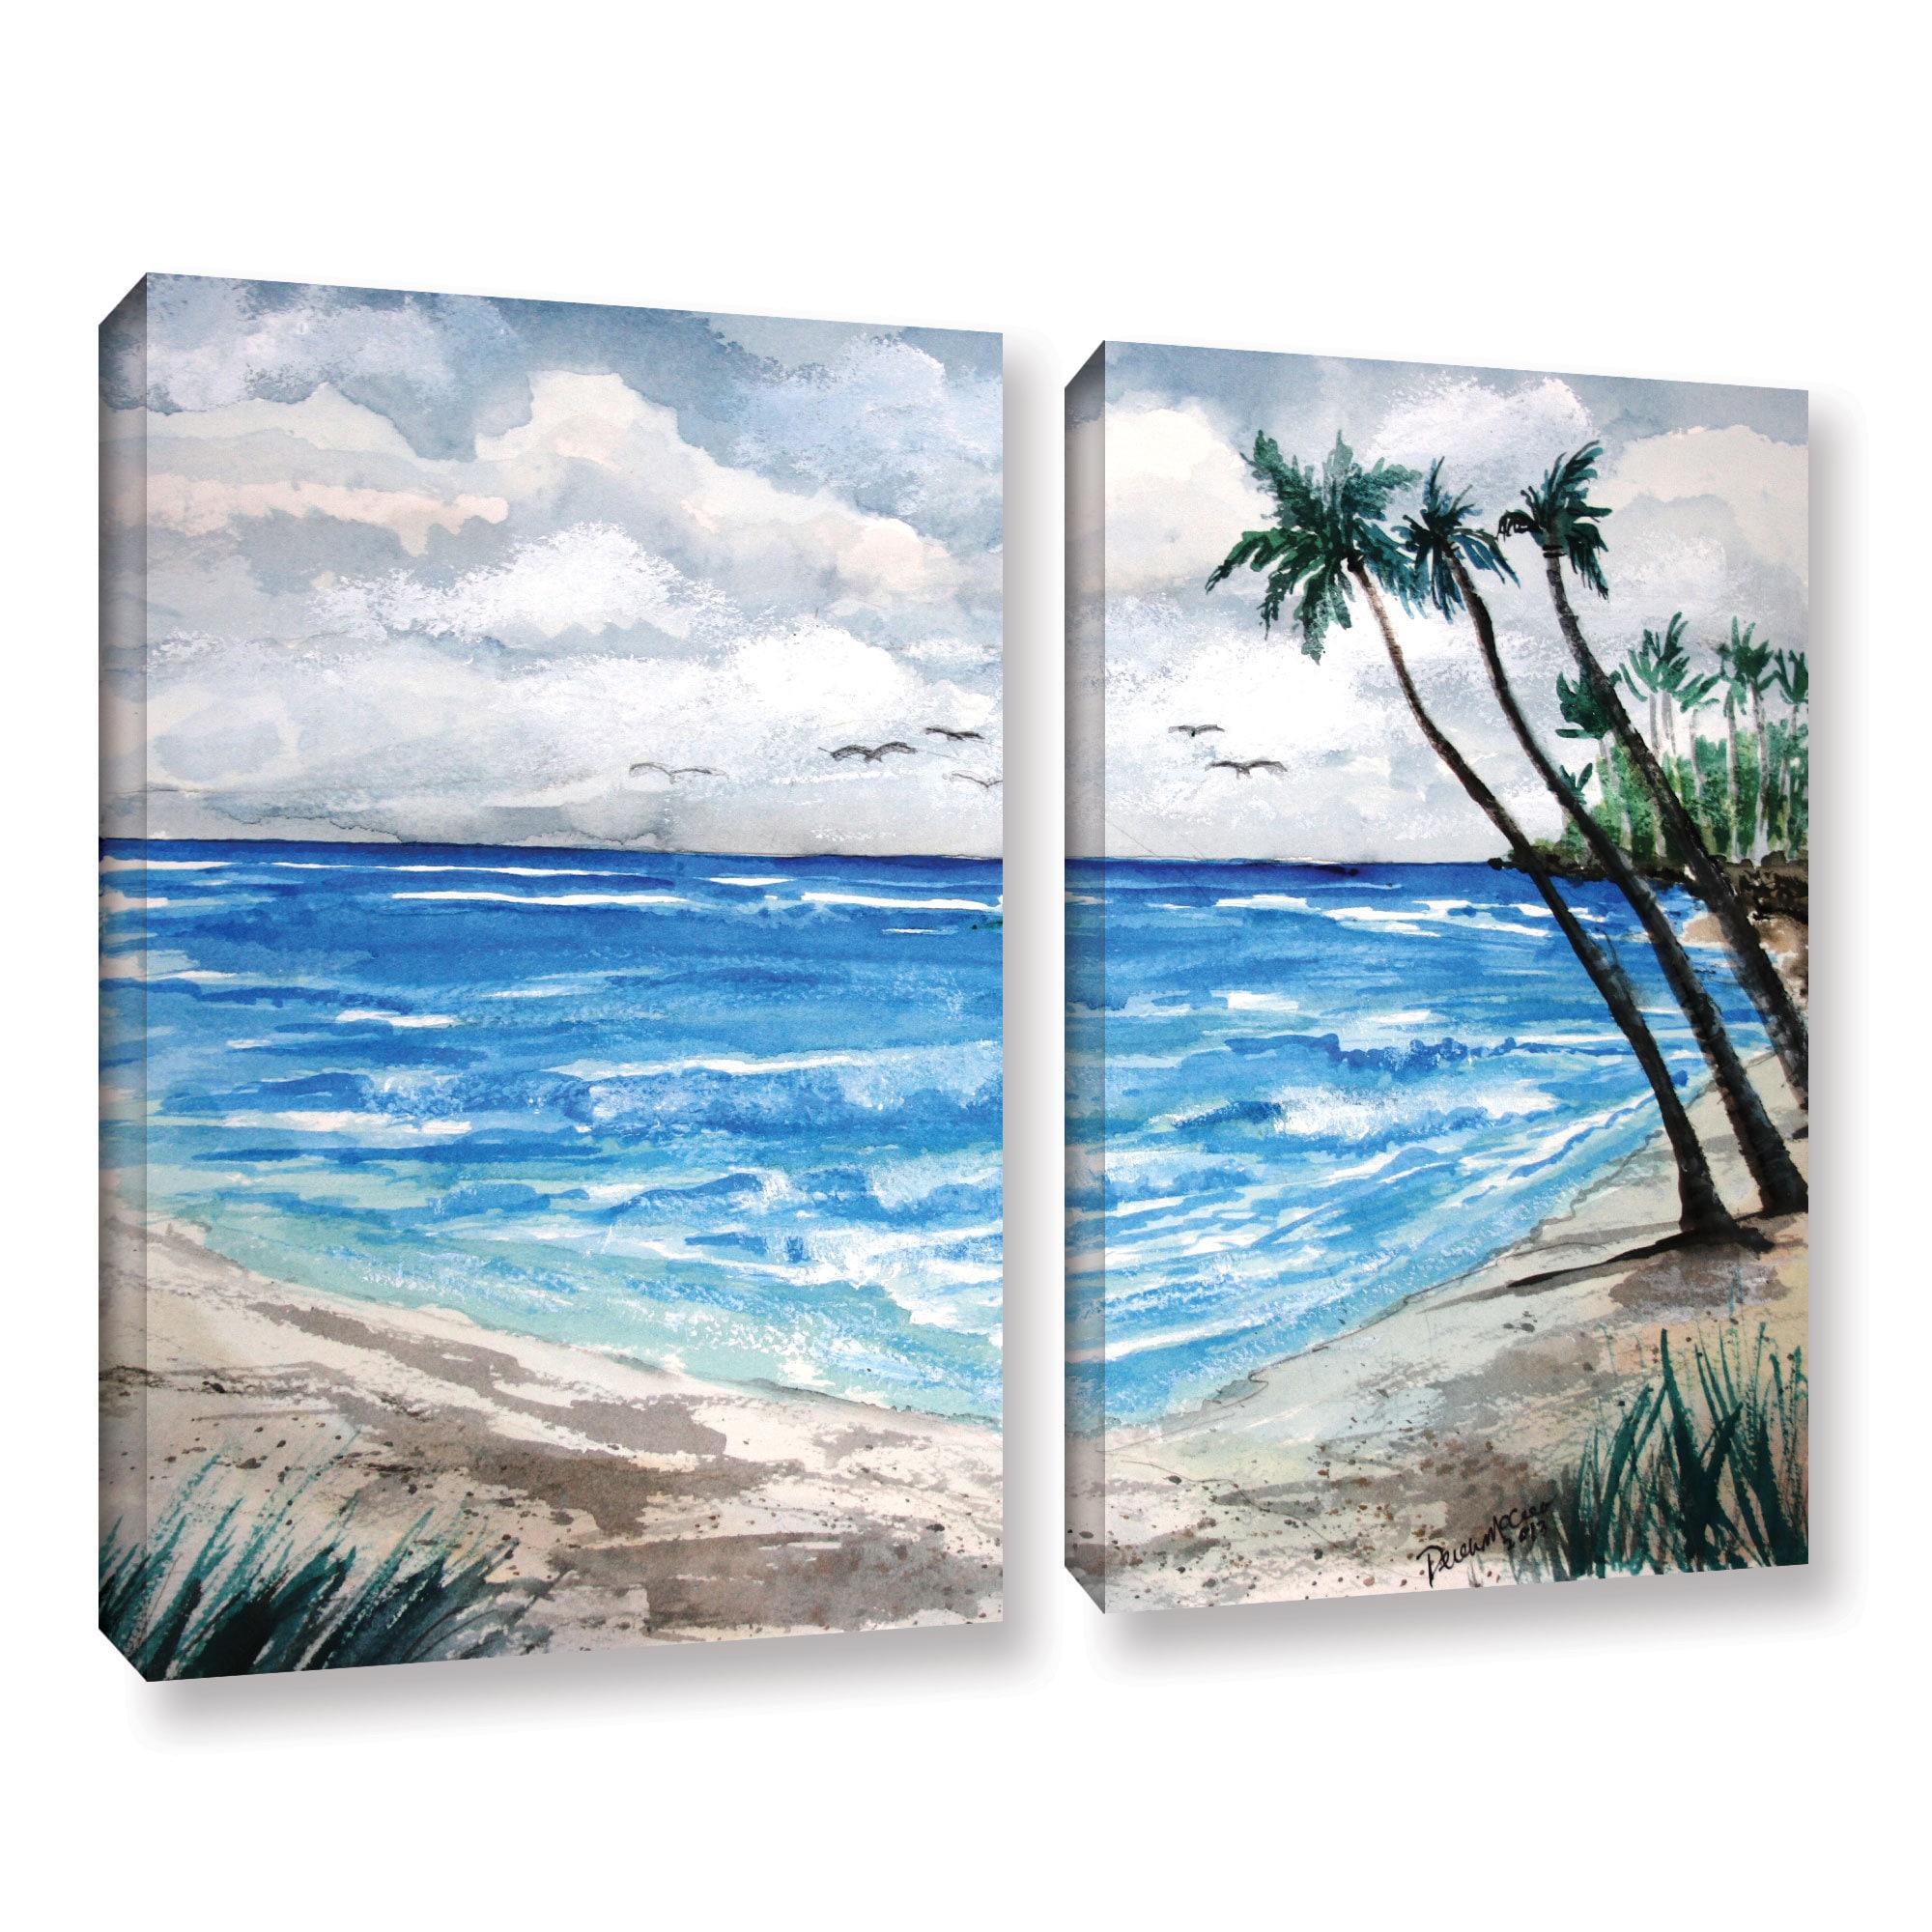 Derek McCrea's 'Beach' 20 Piece Gallery Wrapped Canvas Set